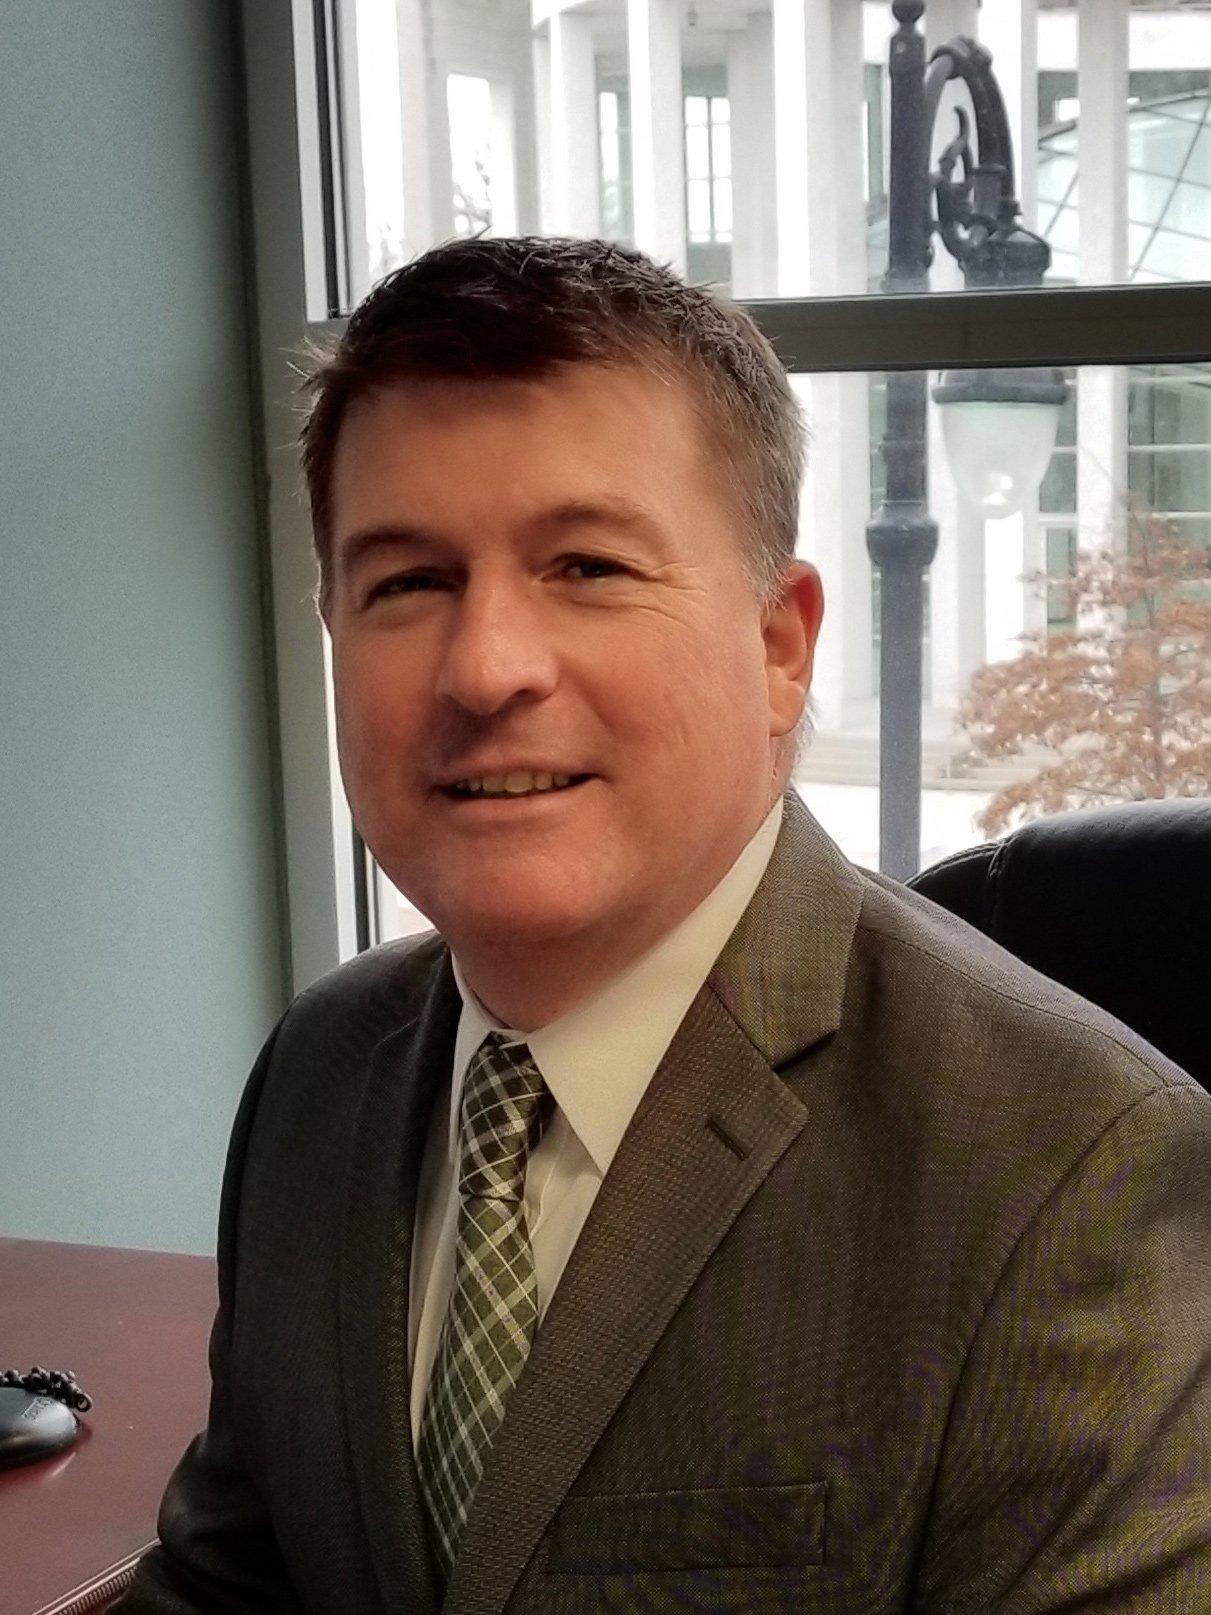 Attorney John D. Connor